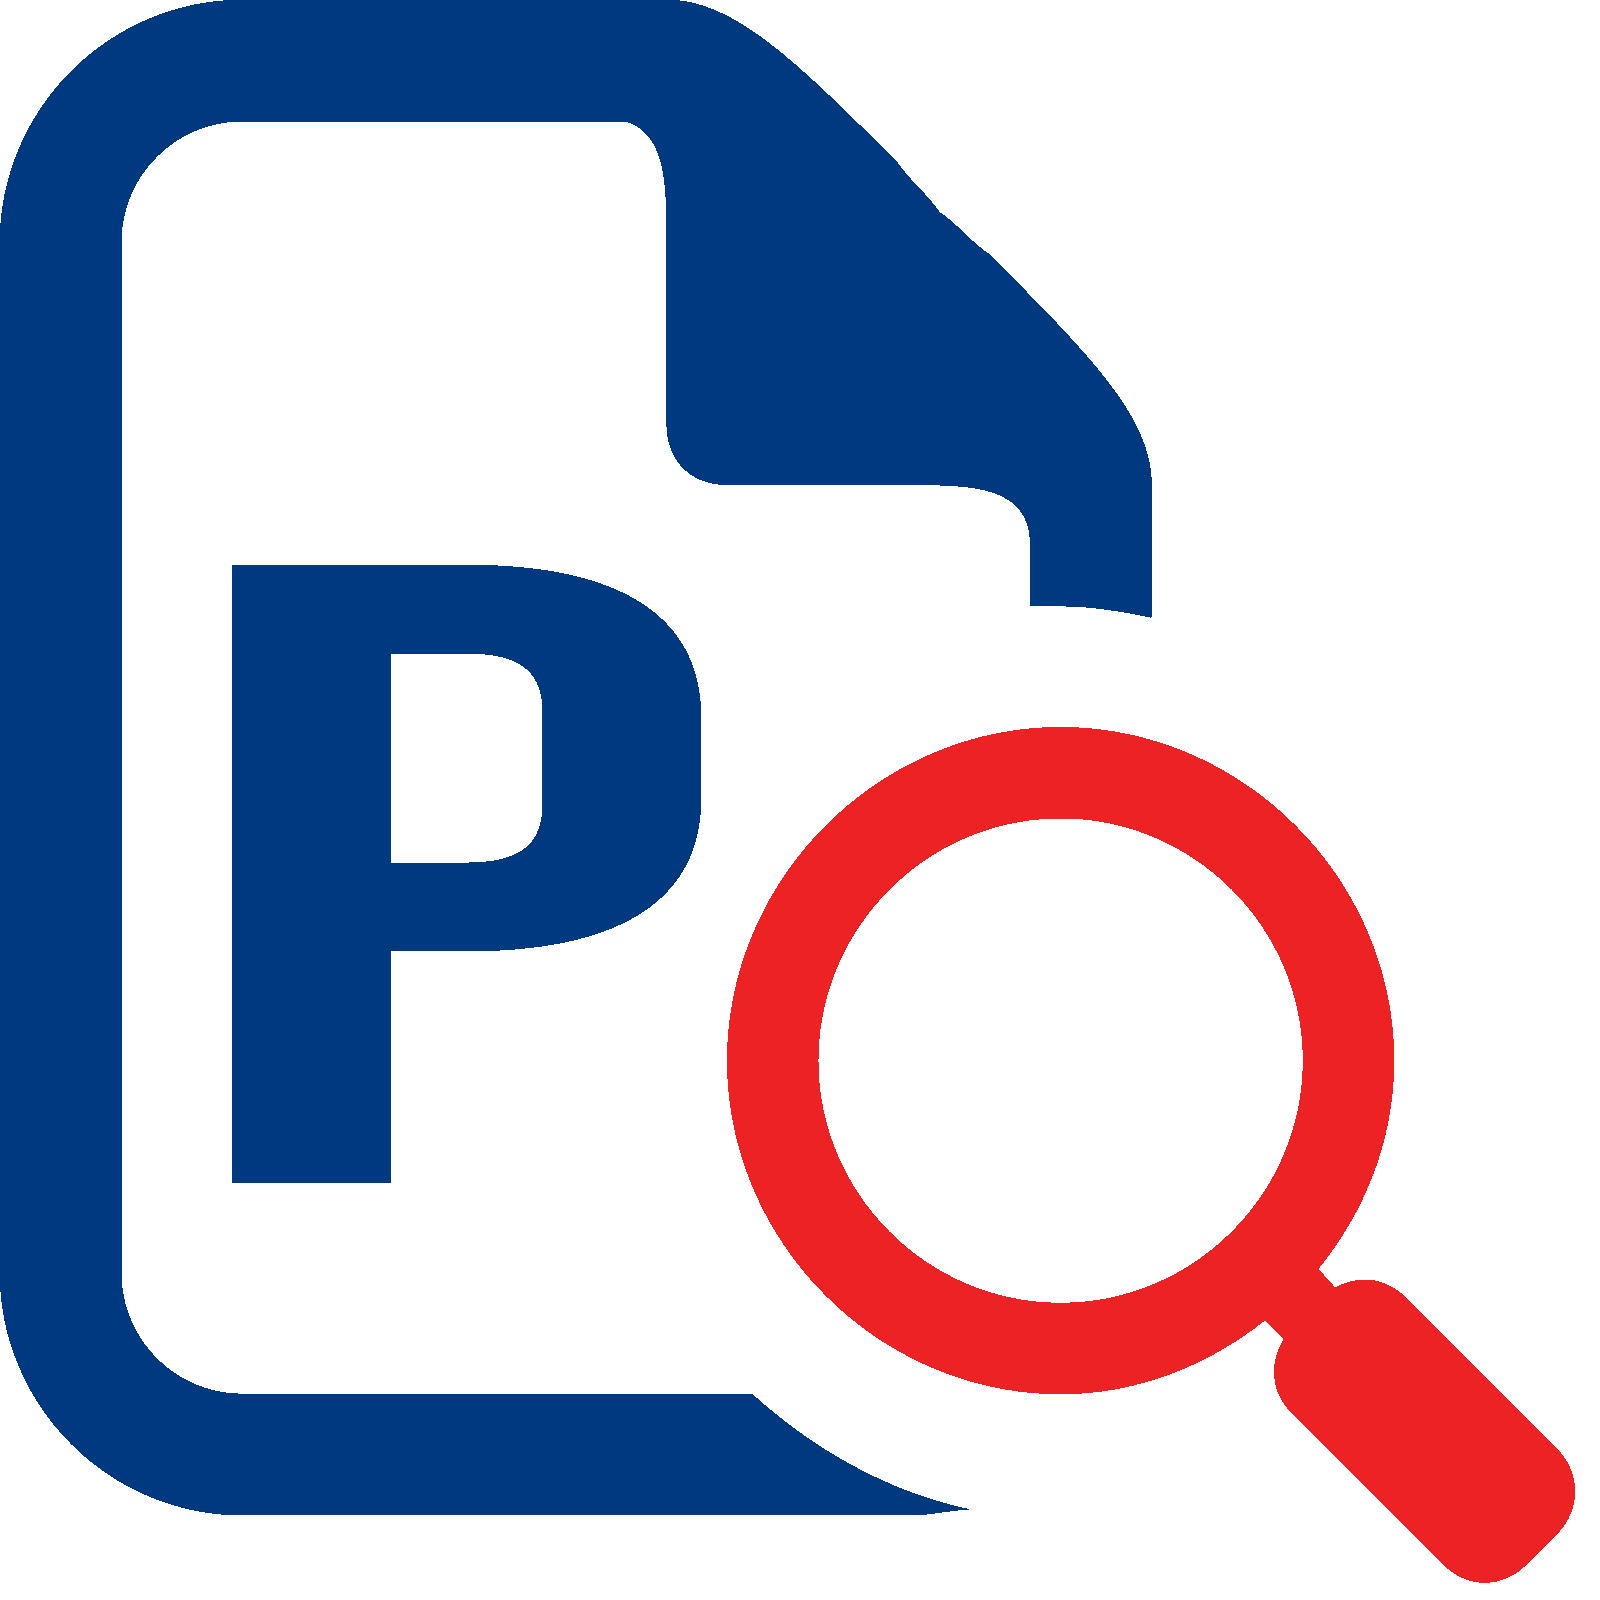 view program icon